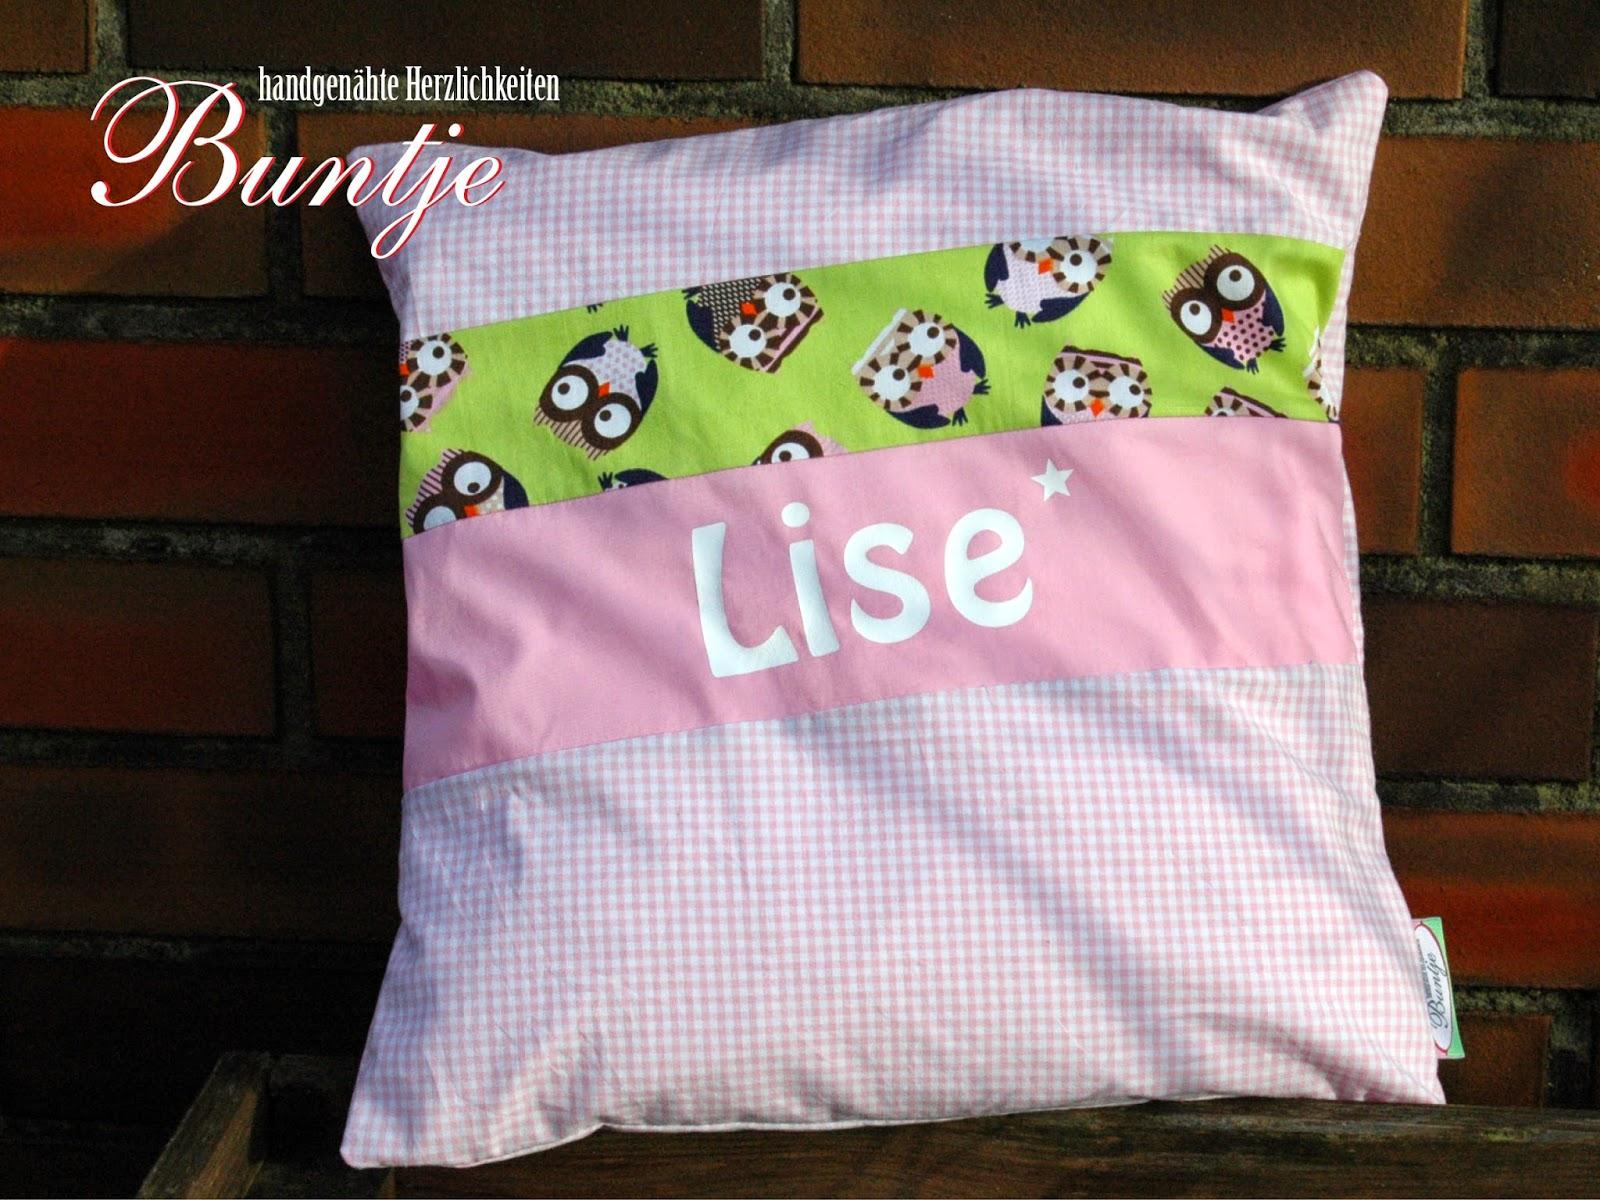 Namenskissen Kissen Name Geschenk Geburt Taufe Geburtstag Mädchen rosa grün Eulen Lise Buntje nähen handmade